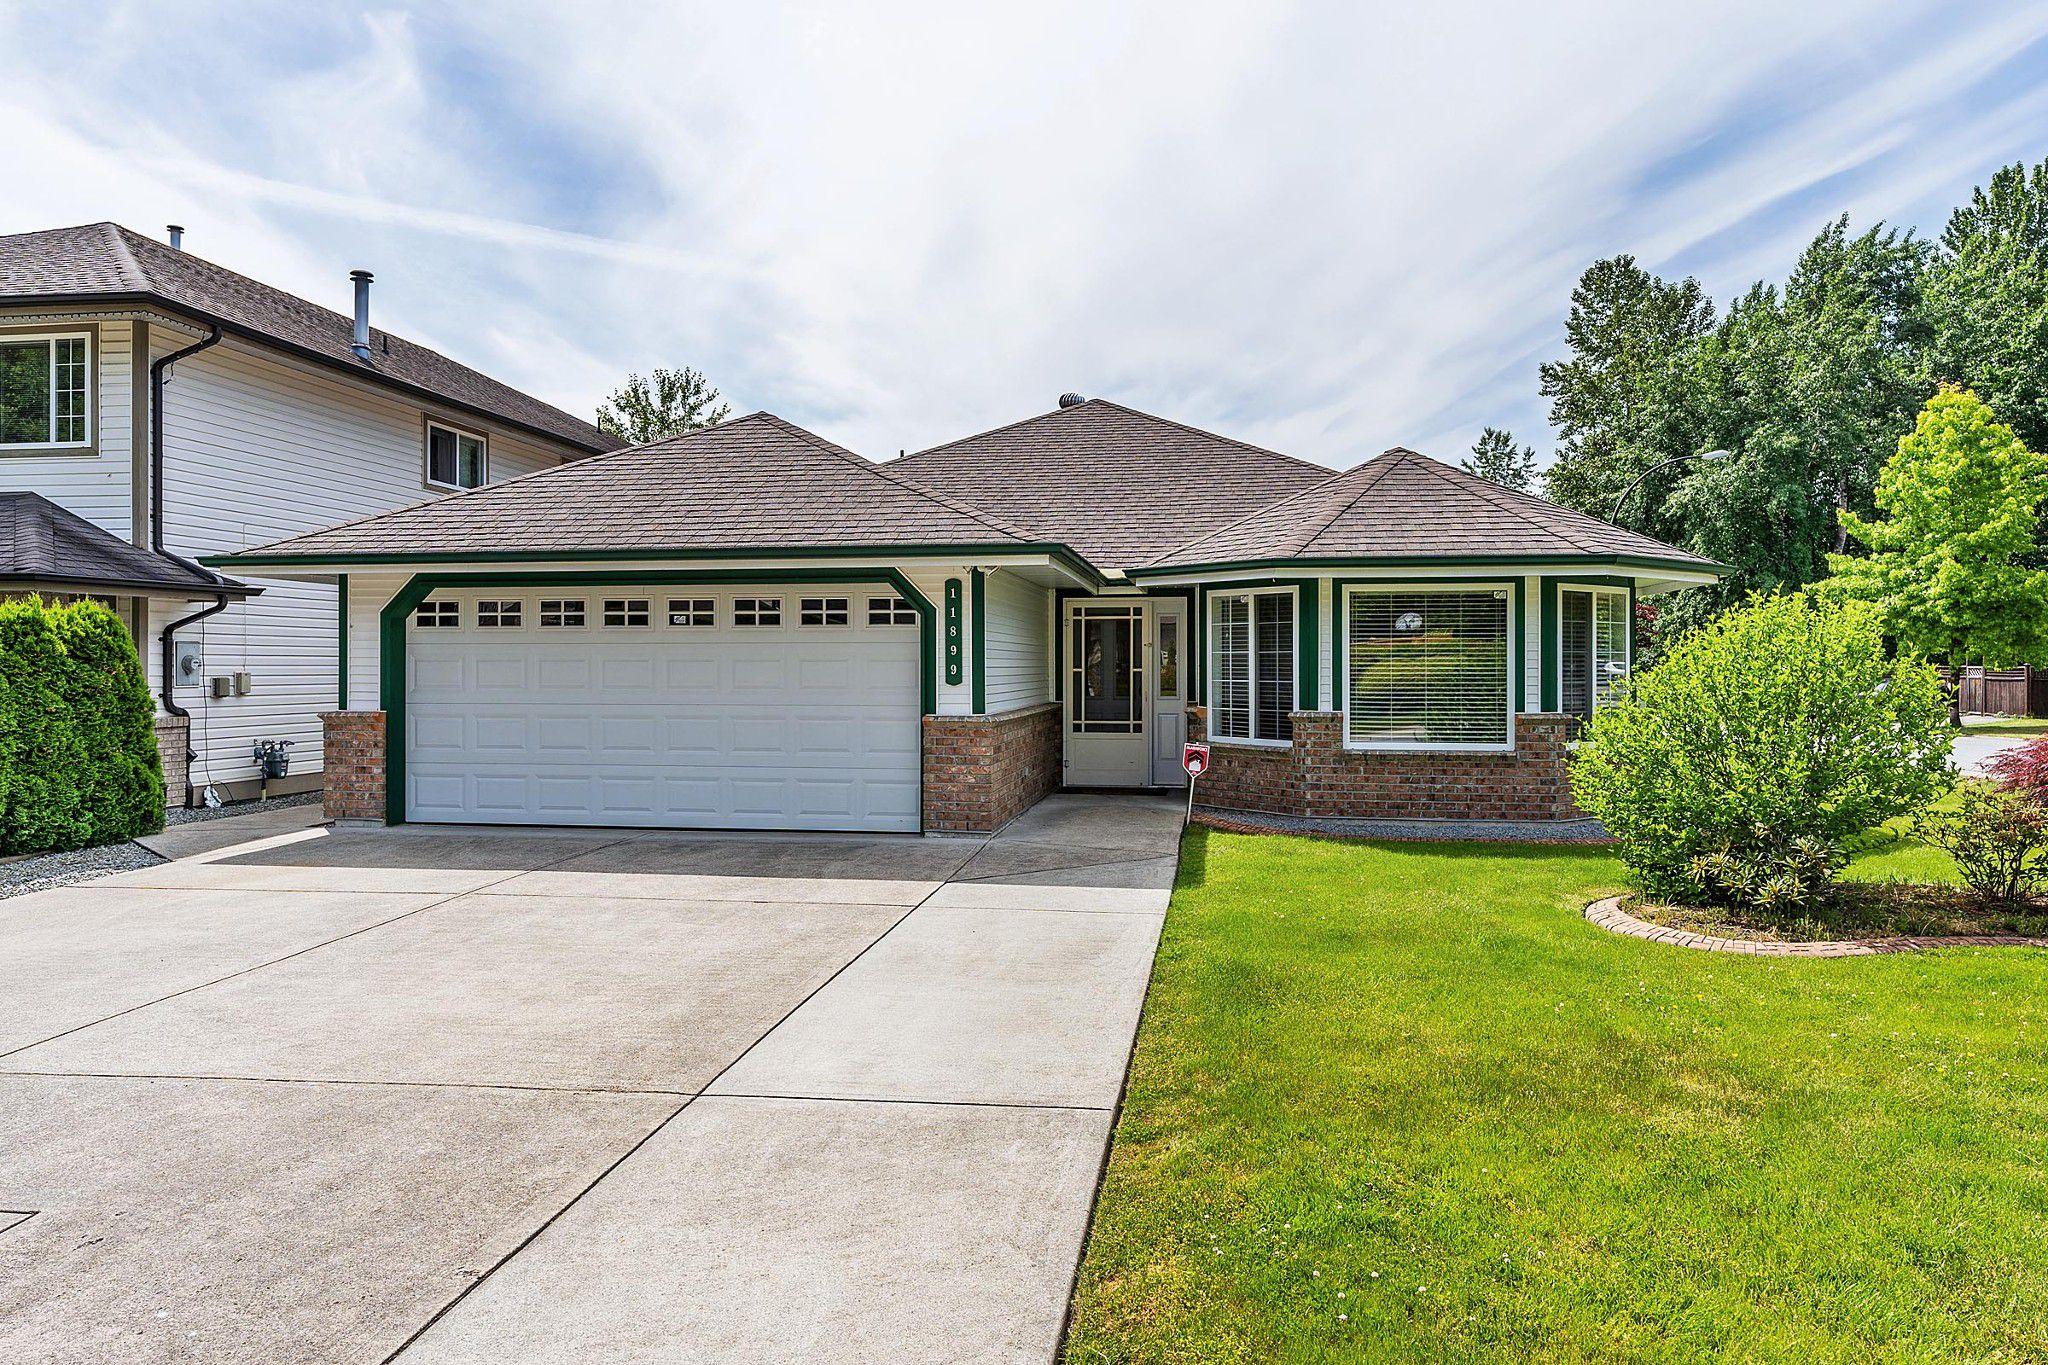 Main Photo: 11899 237 Street in Maple Ridge: Cottonwood MR House for sale : MLS®# R2377865